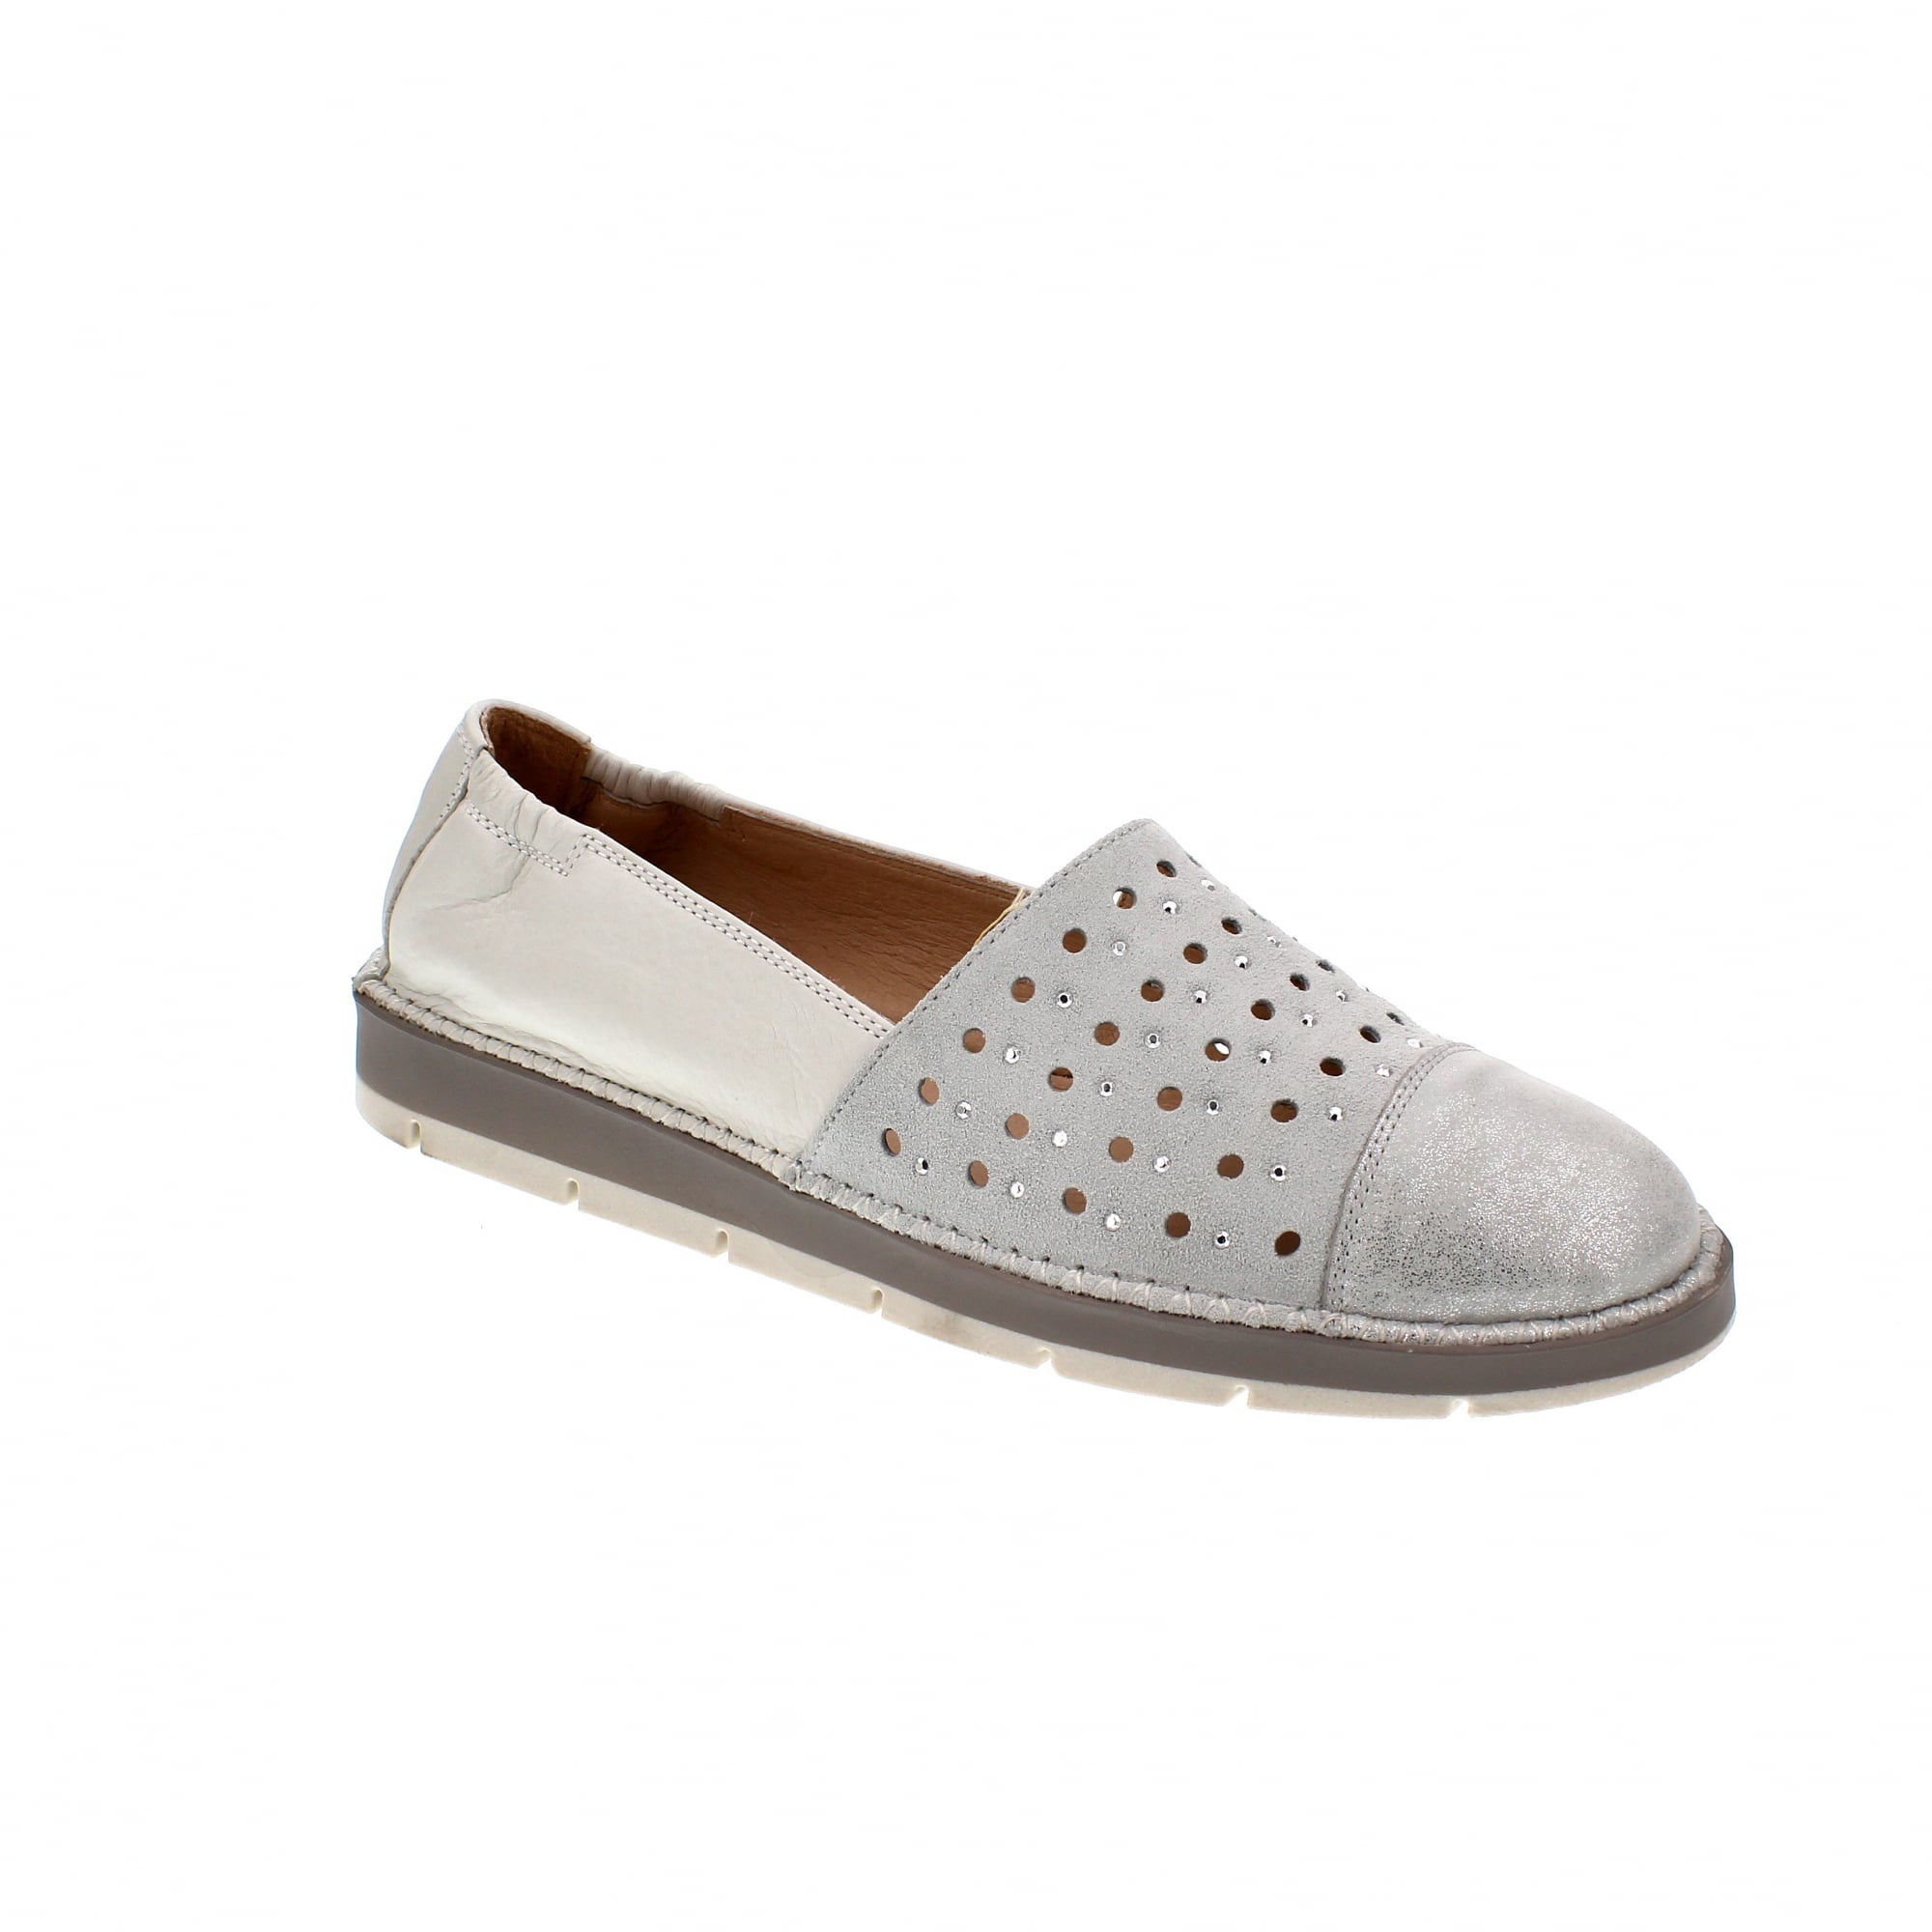 d92609f5a72a1 Hispanitas Maui | 86987-v50 - Womens from Rogerson Shoes UK